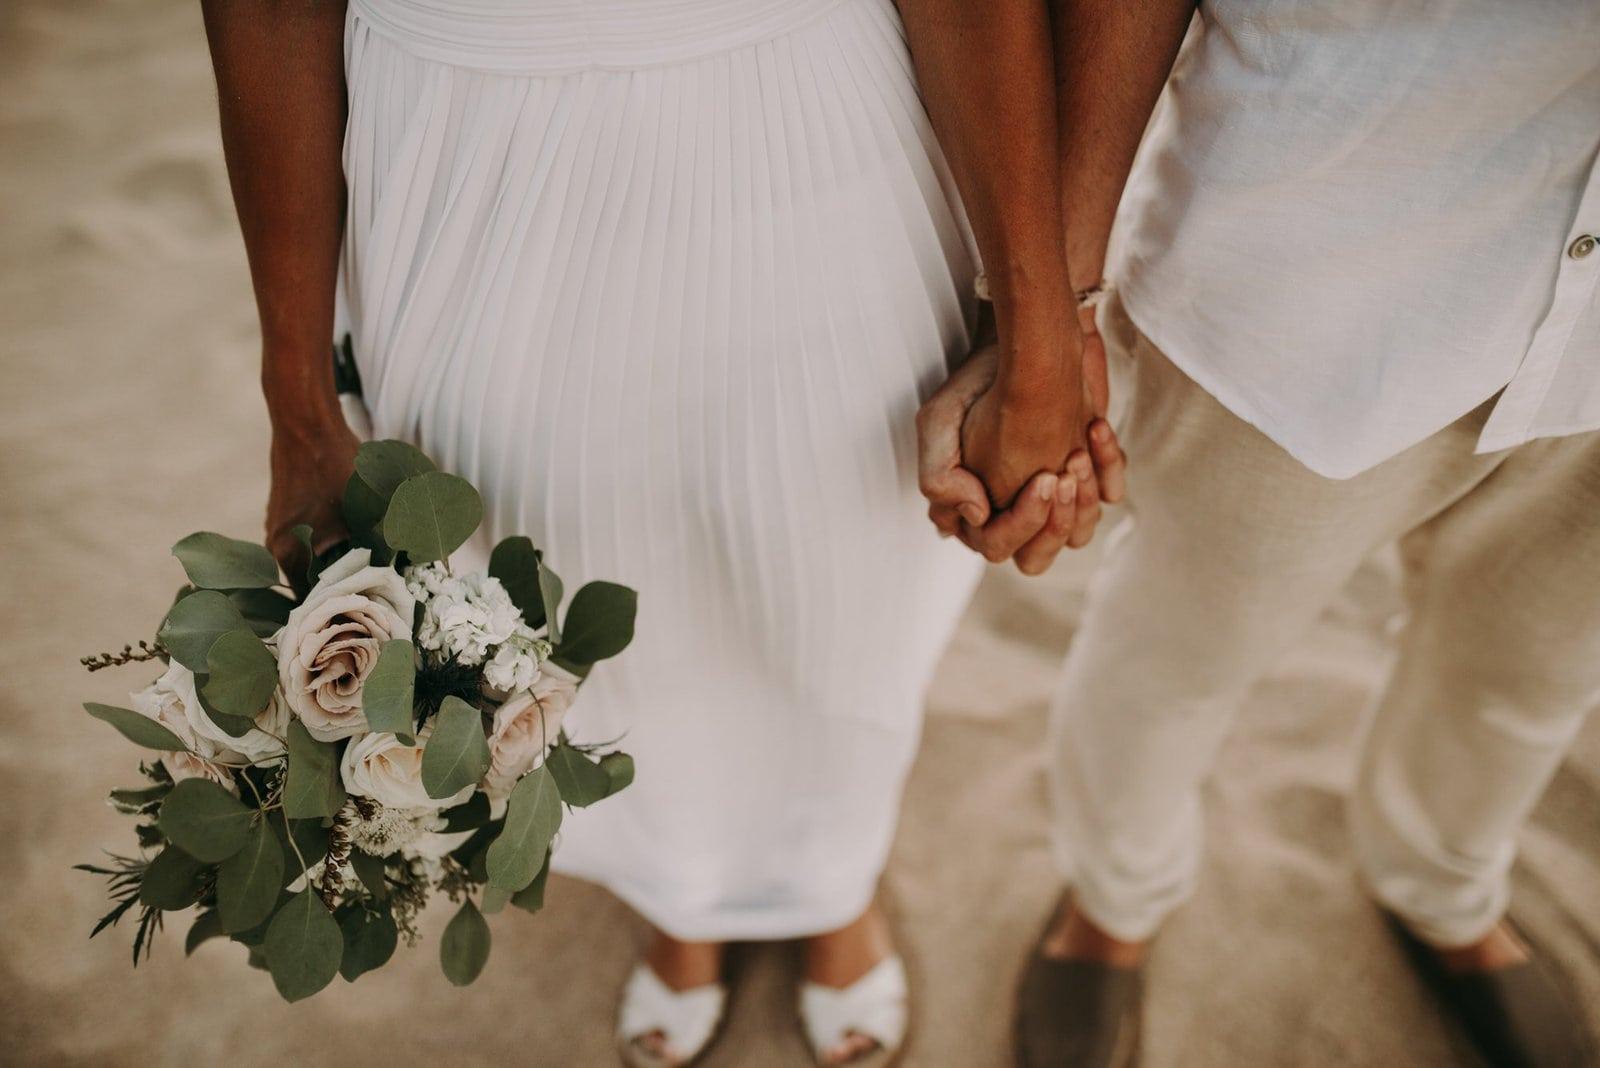 detail shots of wedding